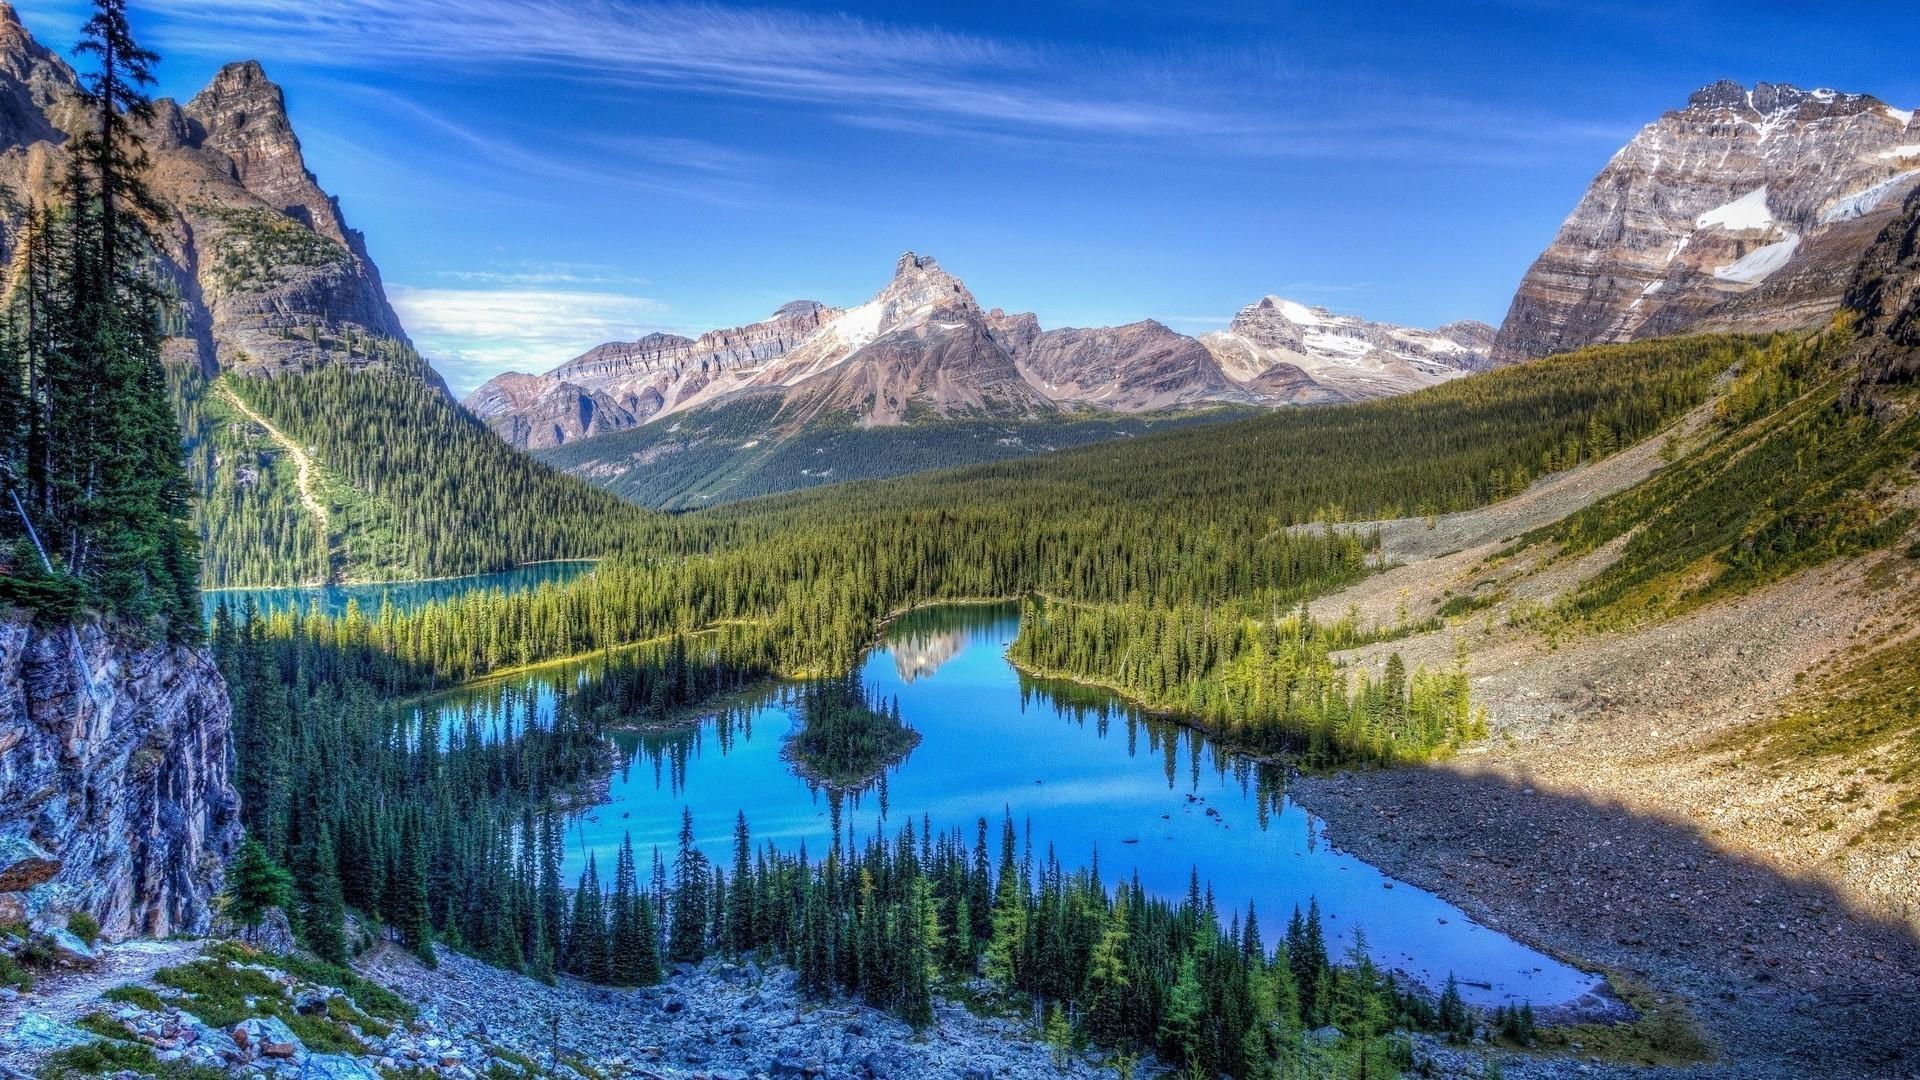 rocky mountain wallpapers for desktop hd free